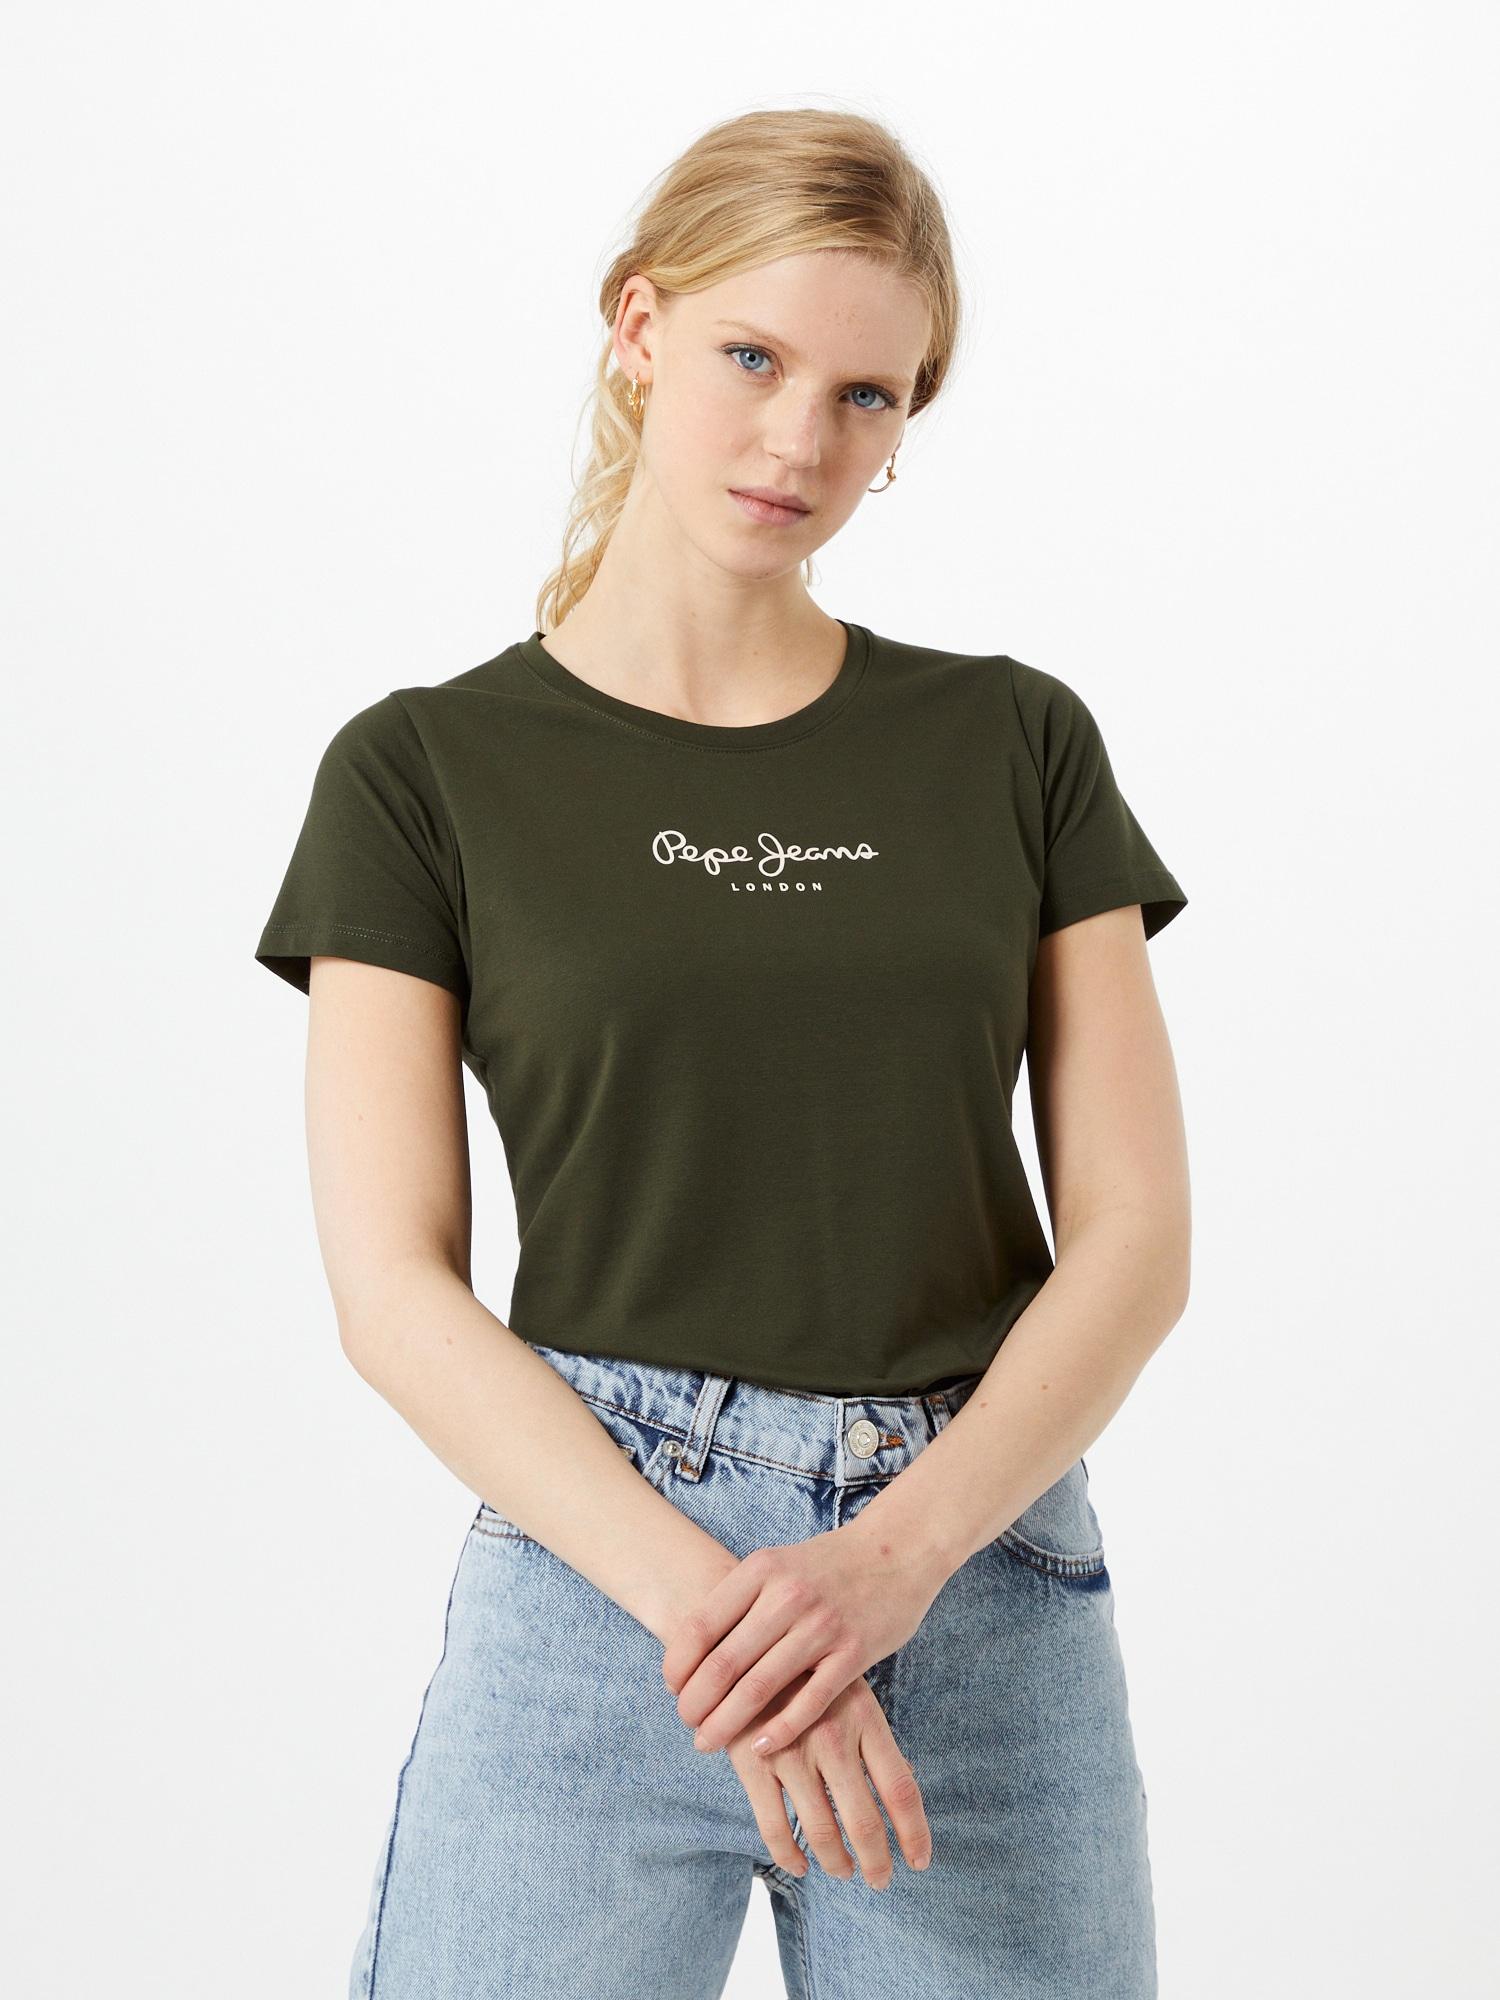 Pepe Jeans T-shirt 'New Virginia'  mörkgrön / vit